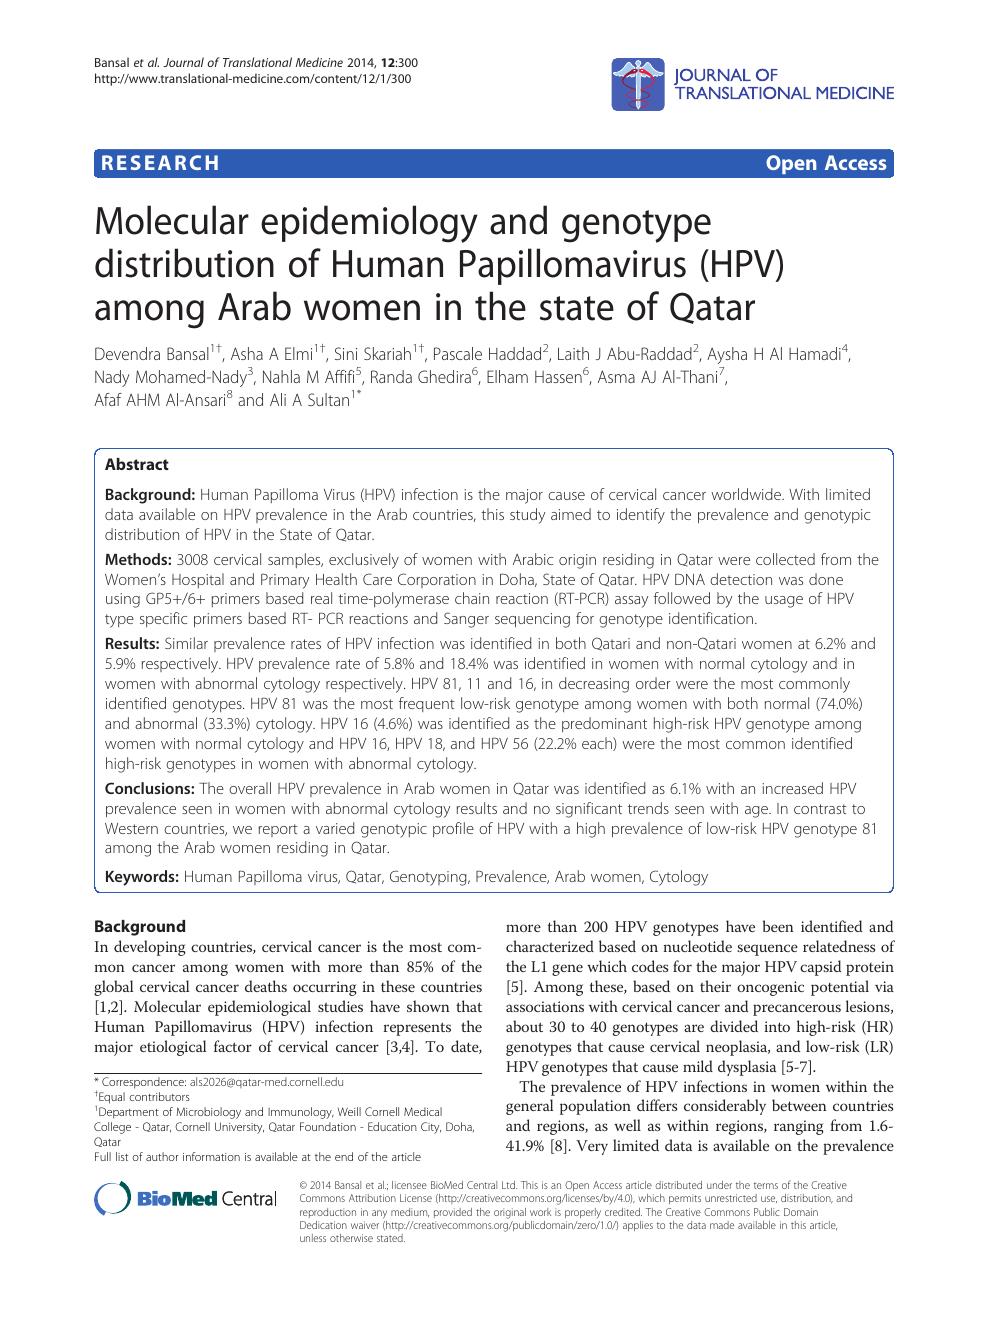 hpv cancer gat